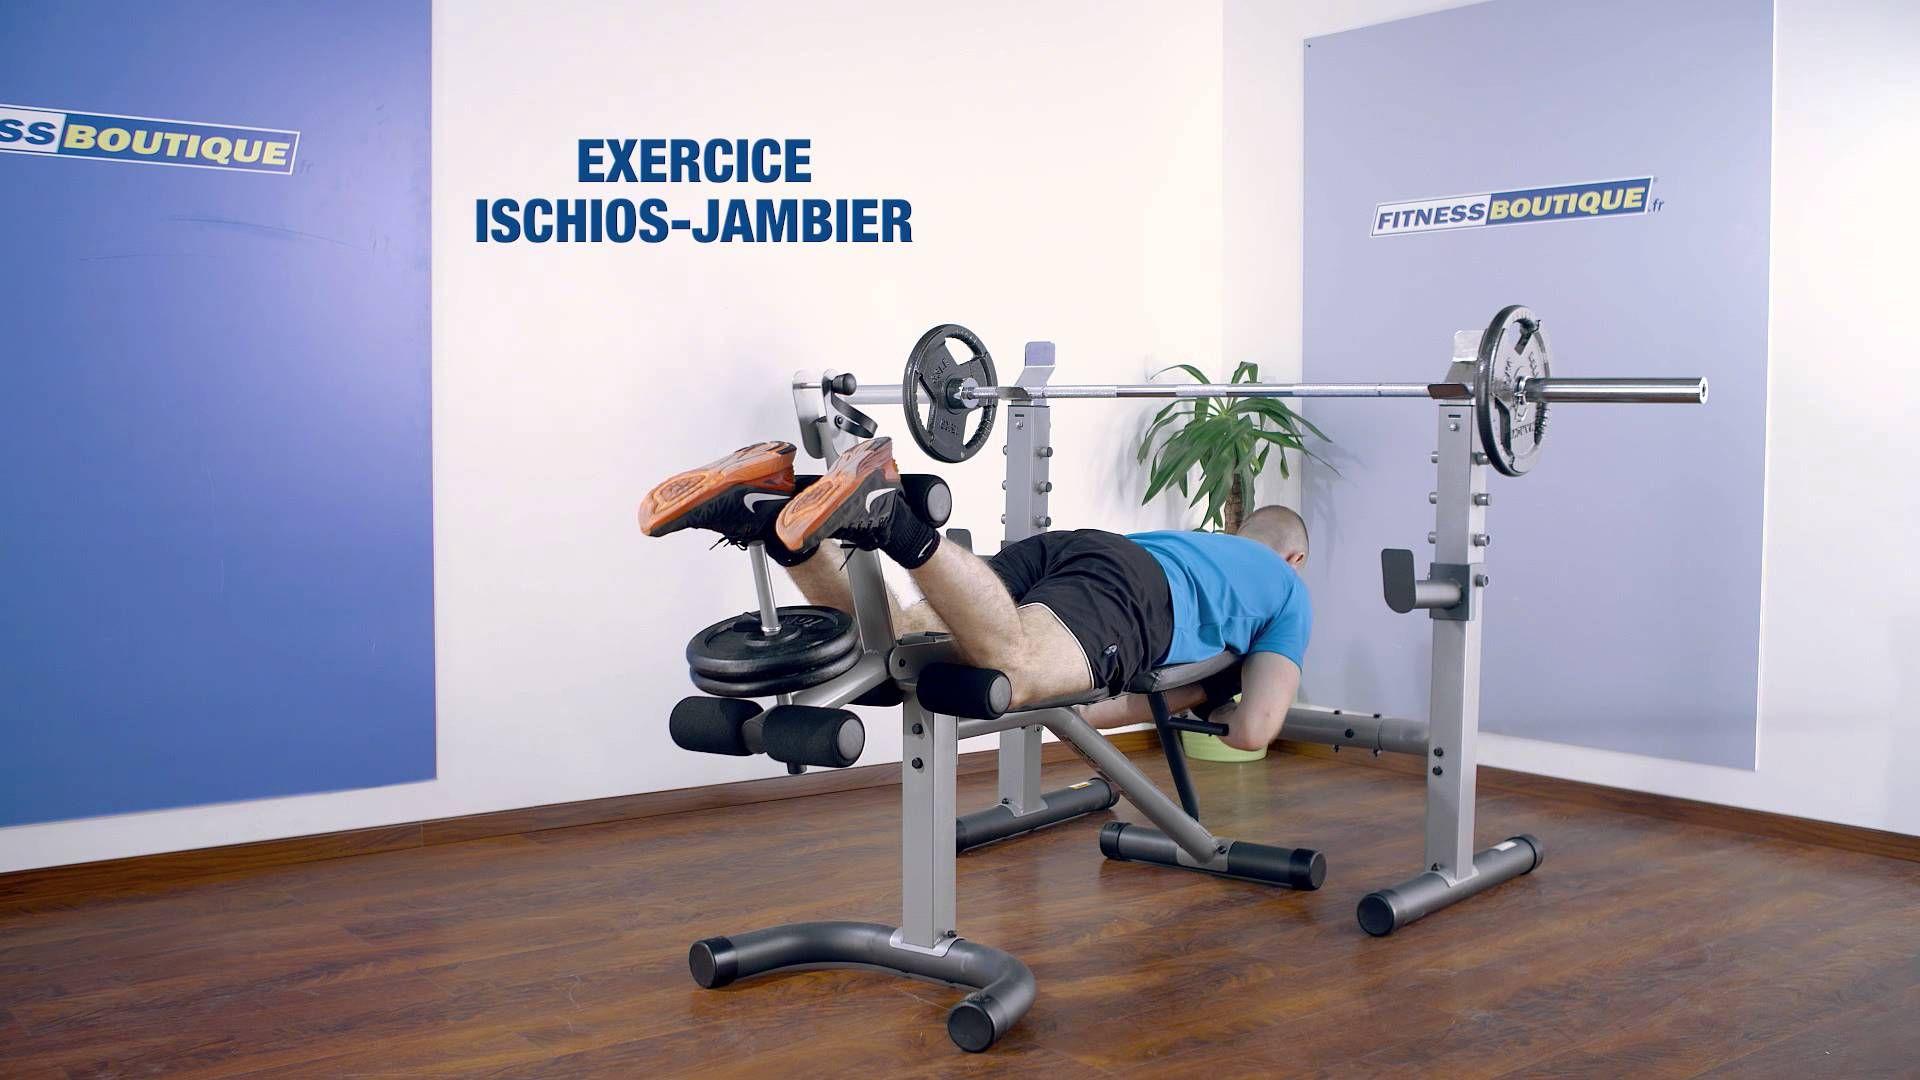 Banc De Musculation Weider Pro 290cw Saad S Board Homework